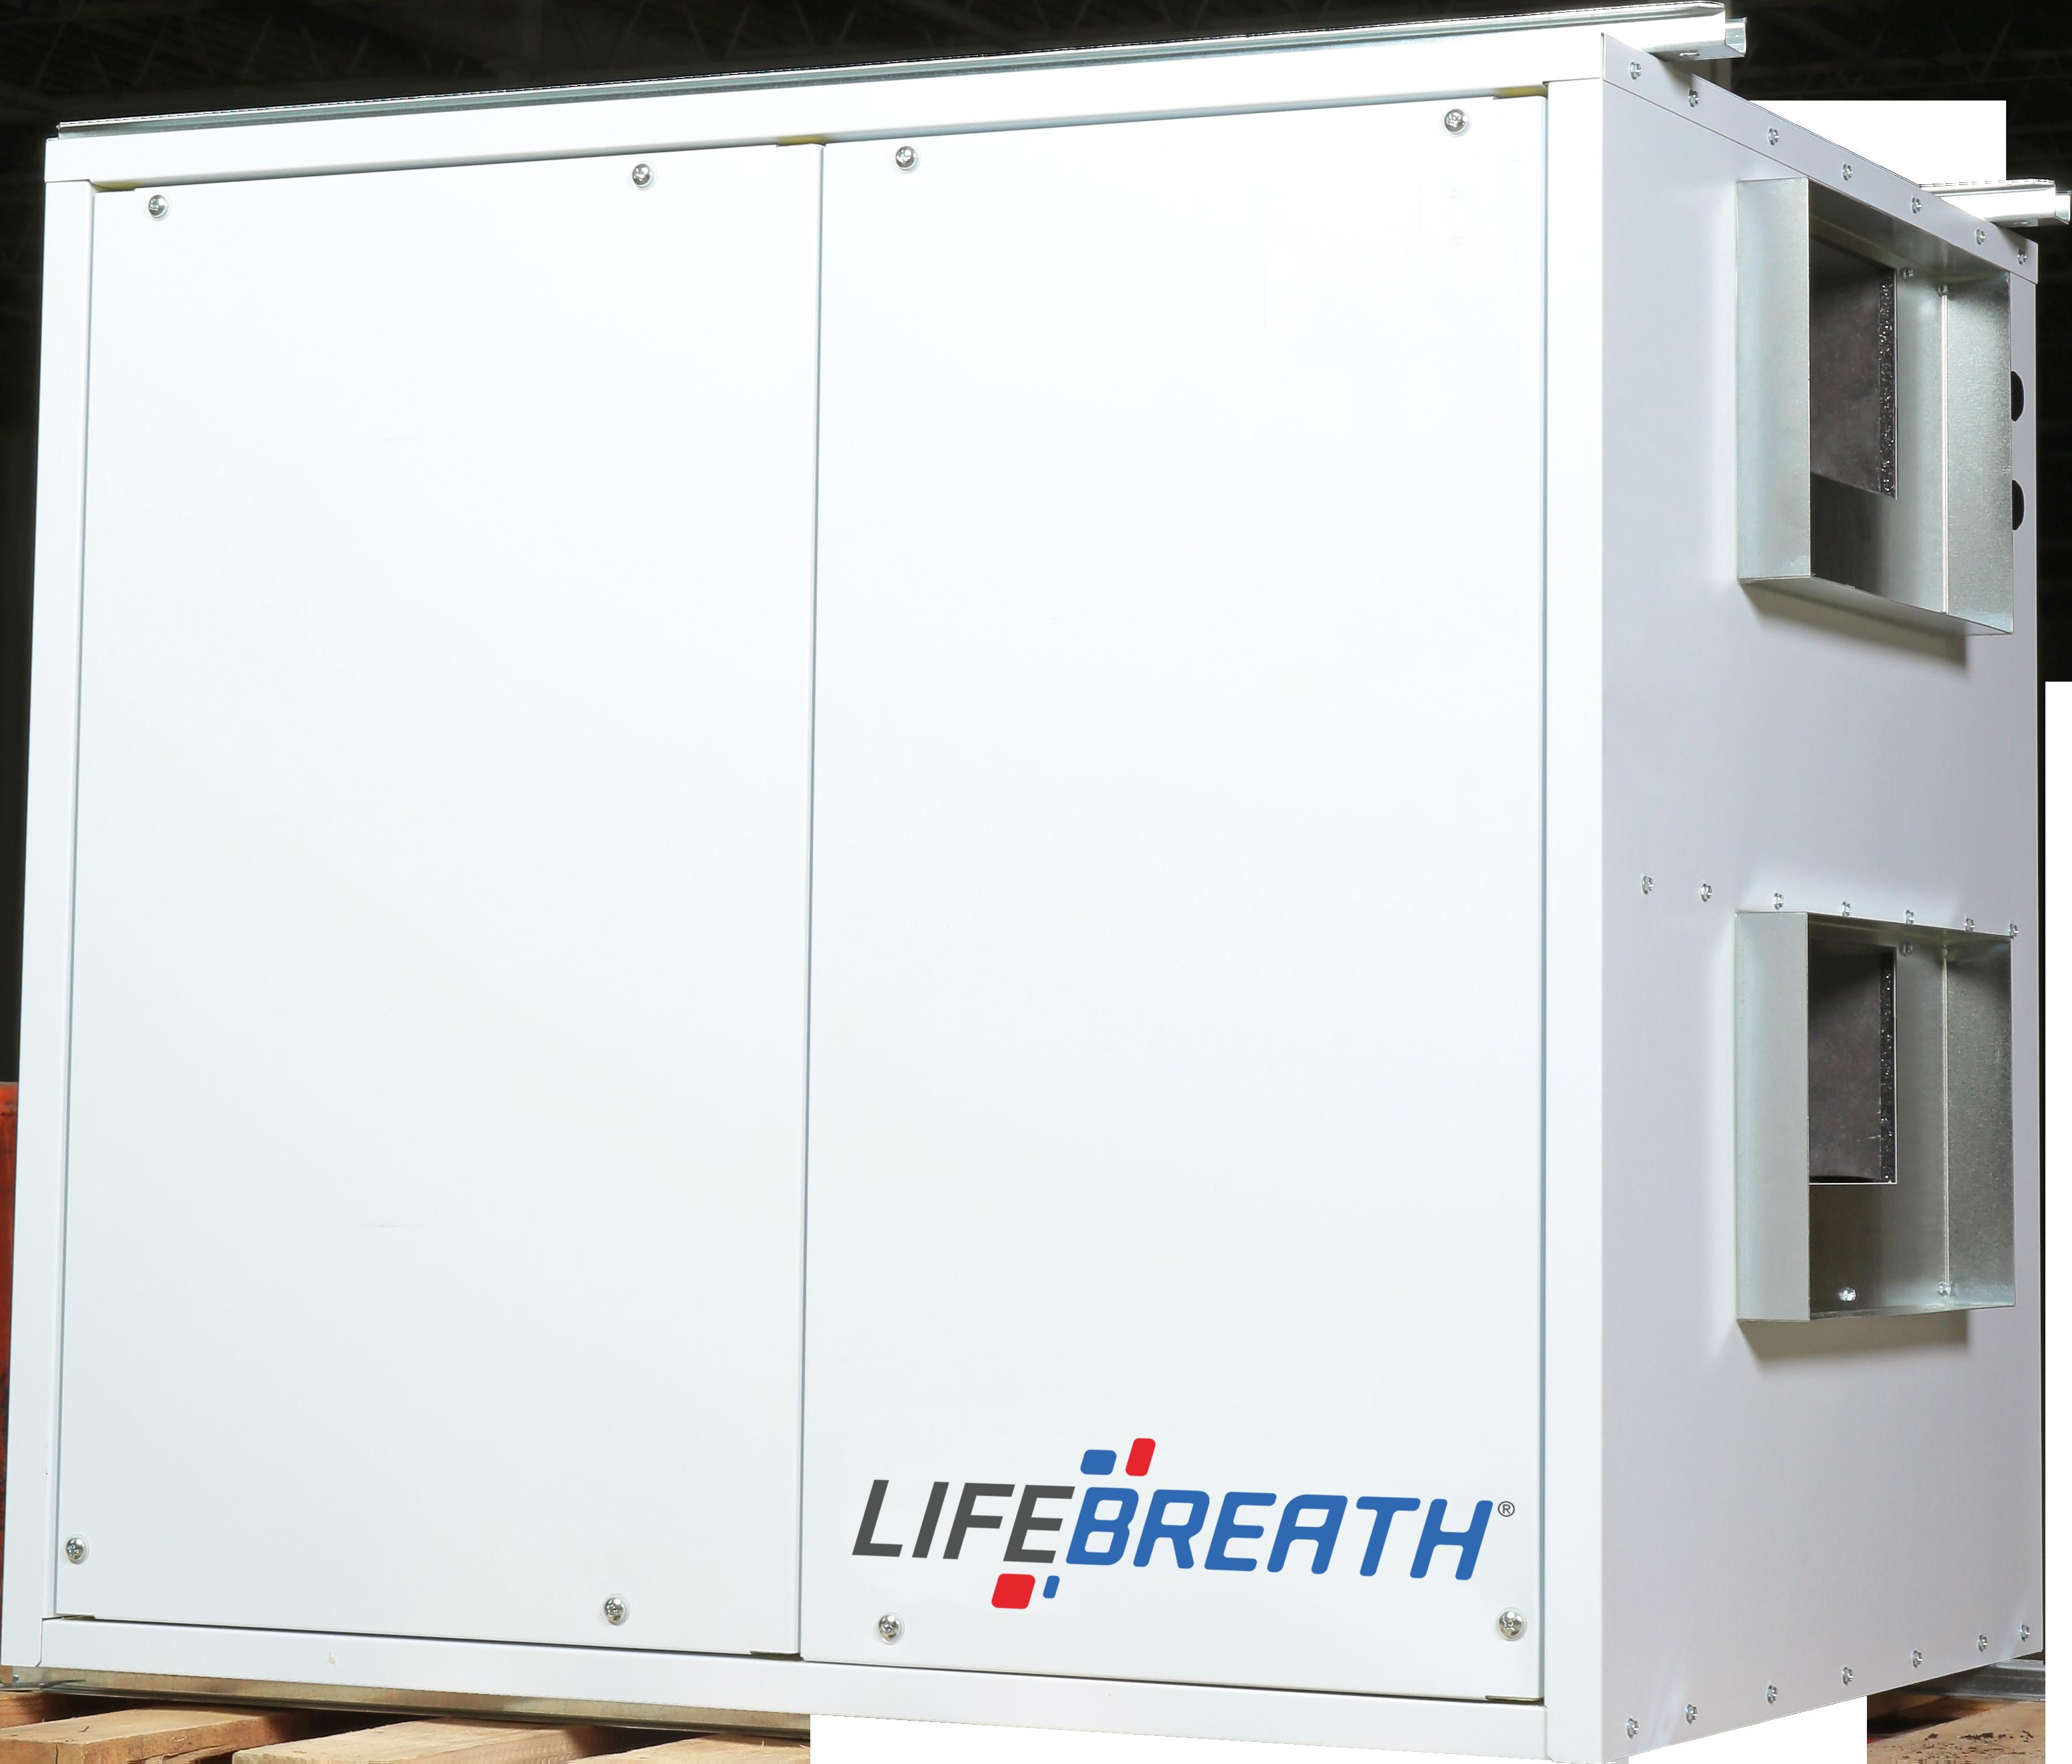 Lifebreath 530 ERV Commercial Energy Recovery Ventilator